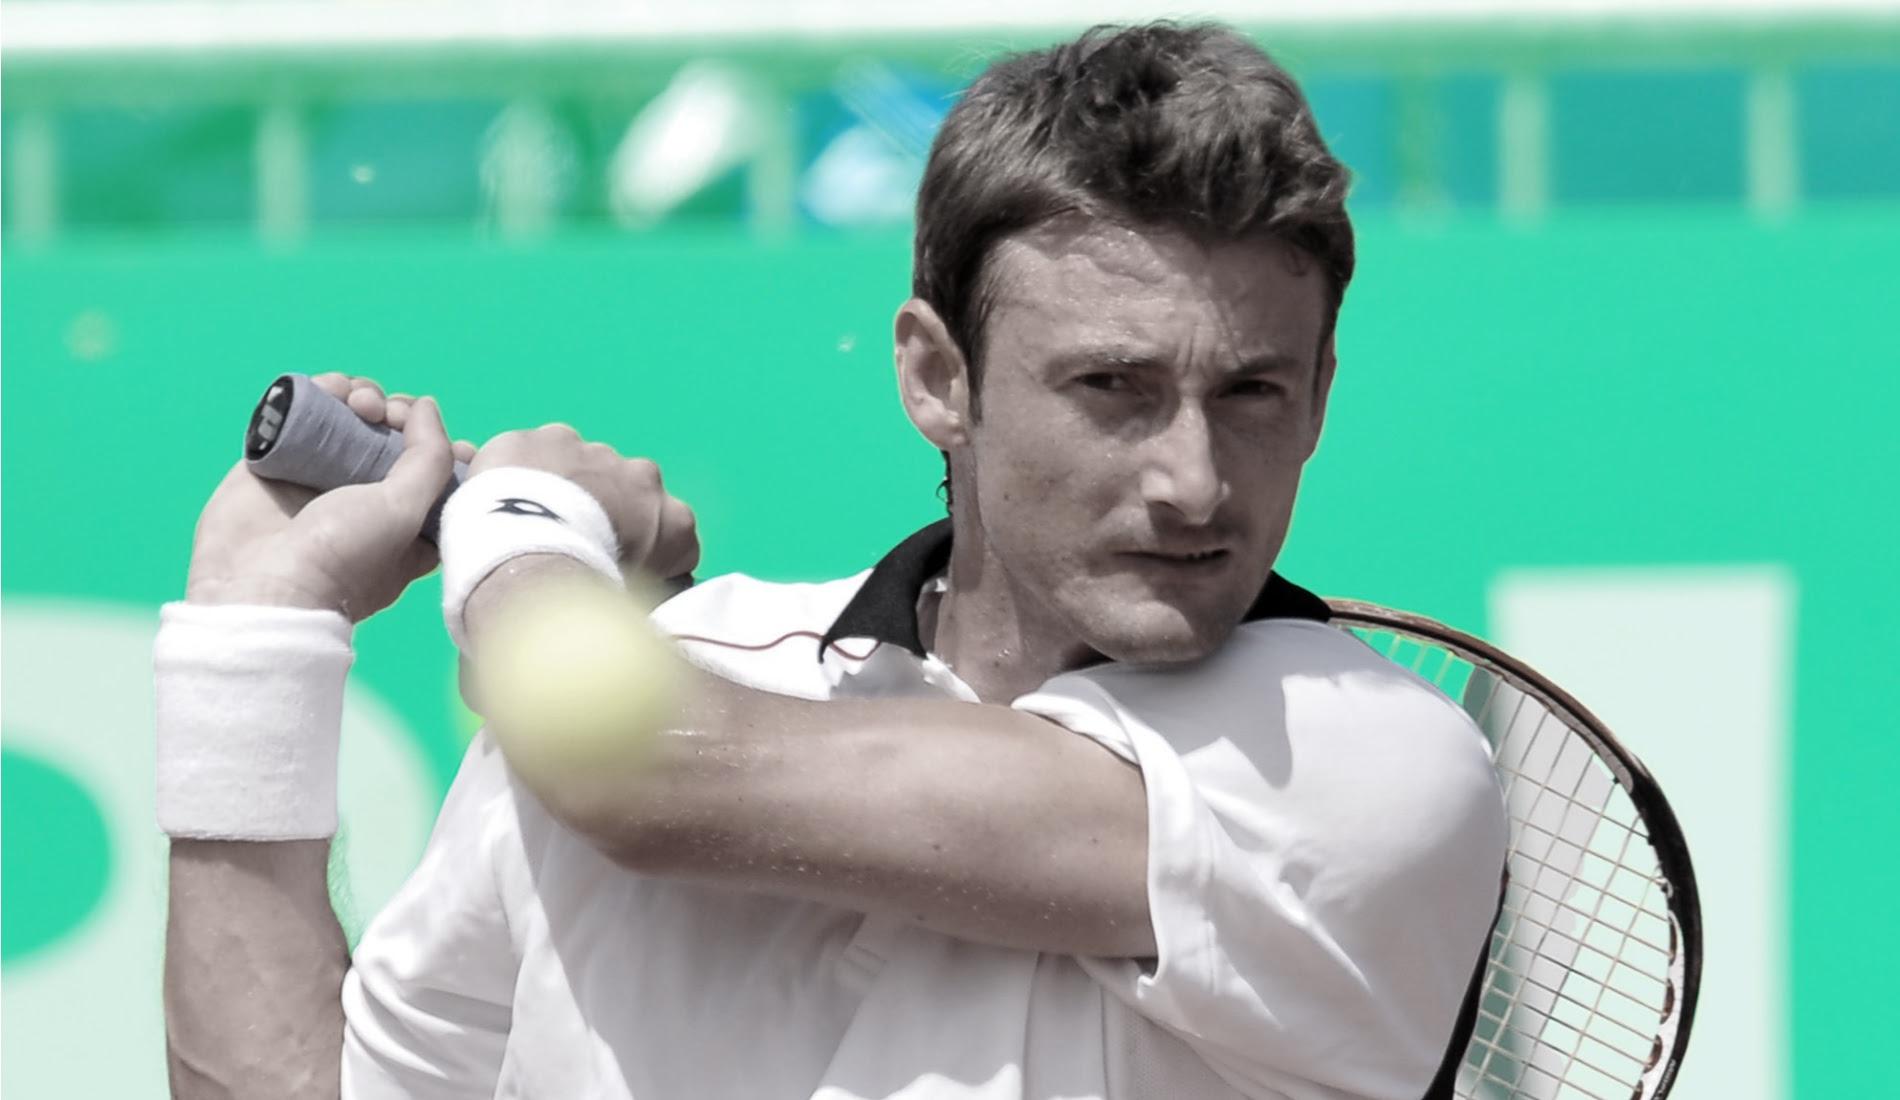 Juan Carlos Ferrero - On this day